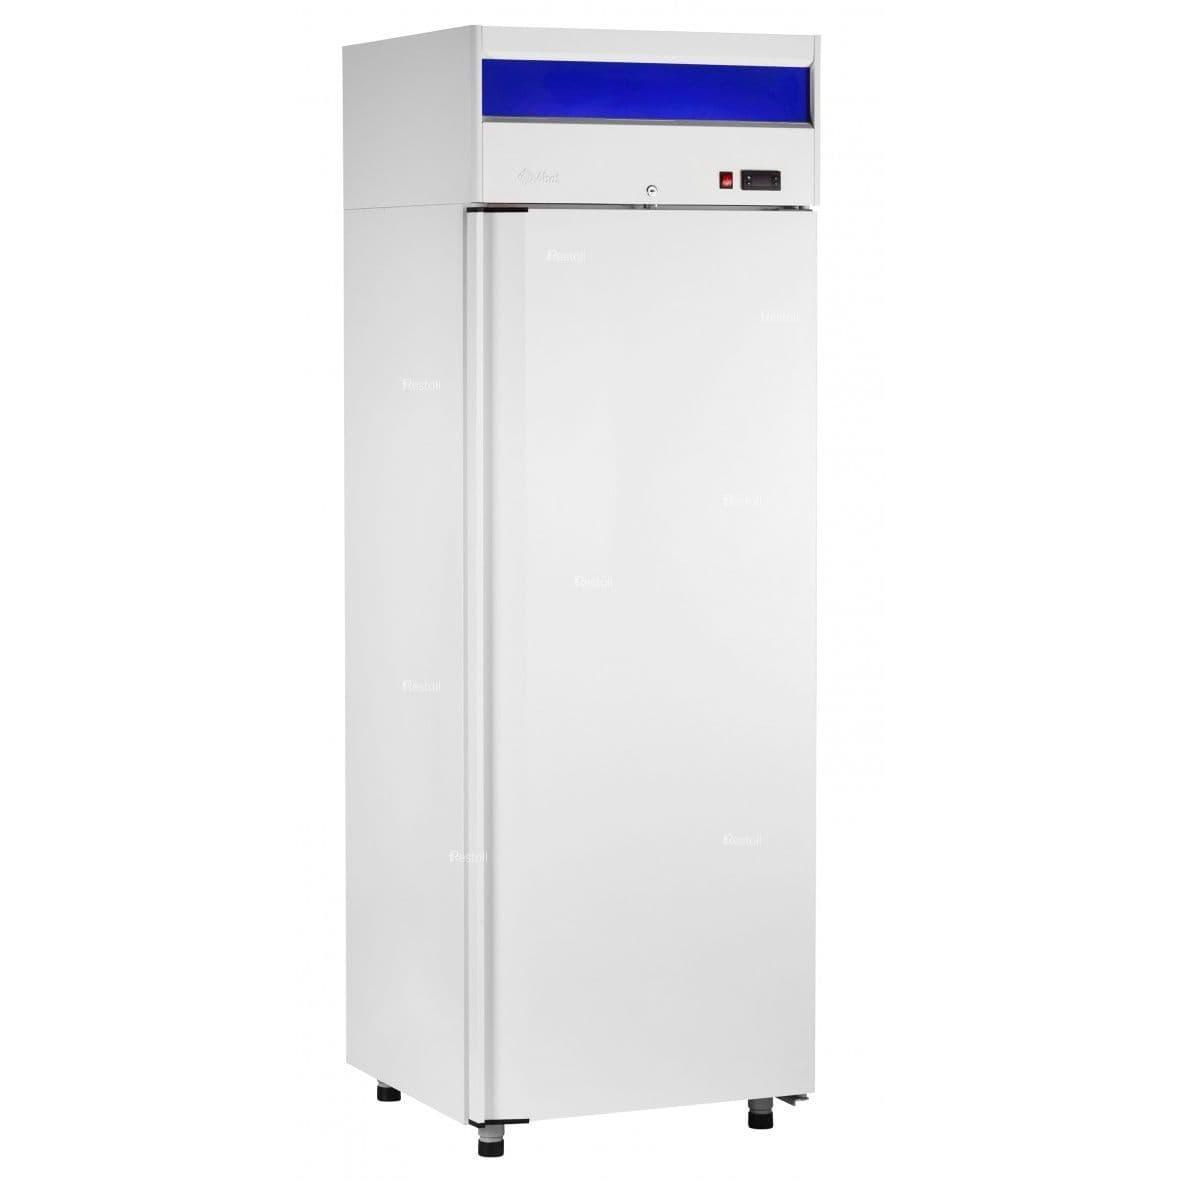 Шкаф морозильный Abat ШХн-0,5 крашеный